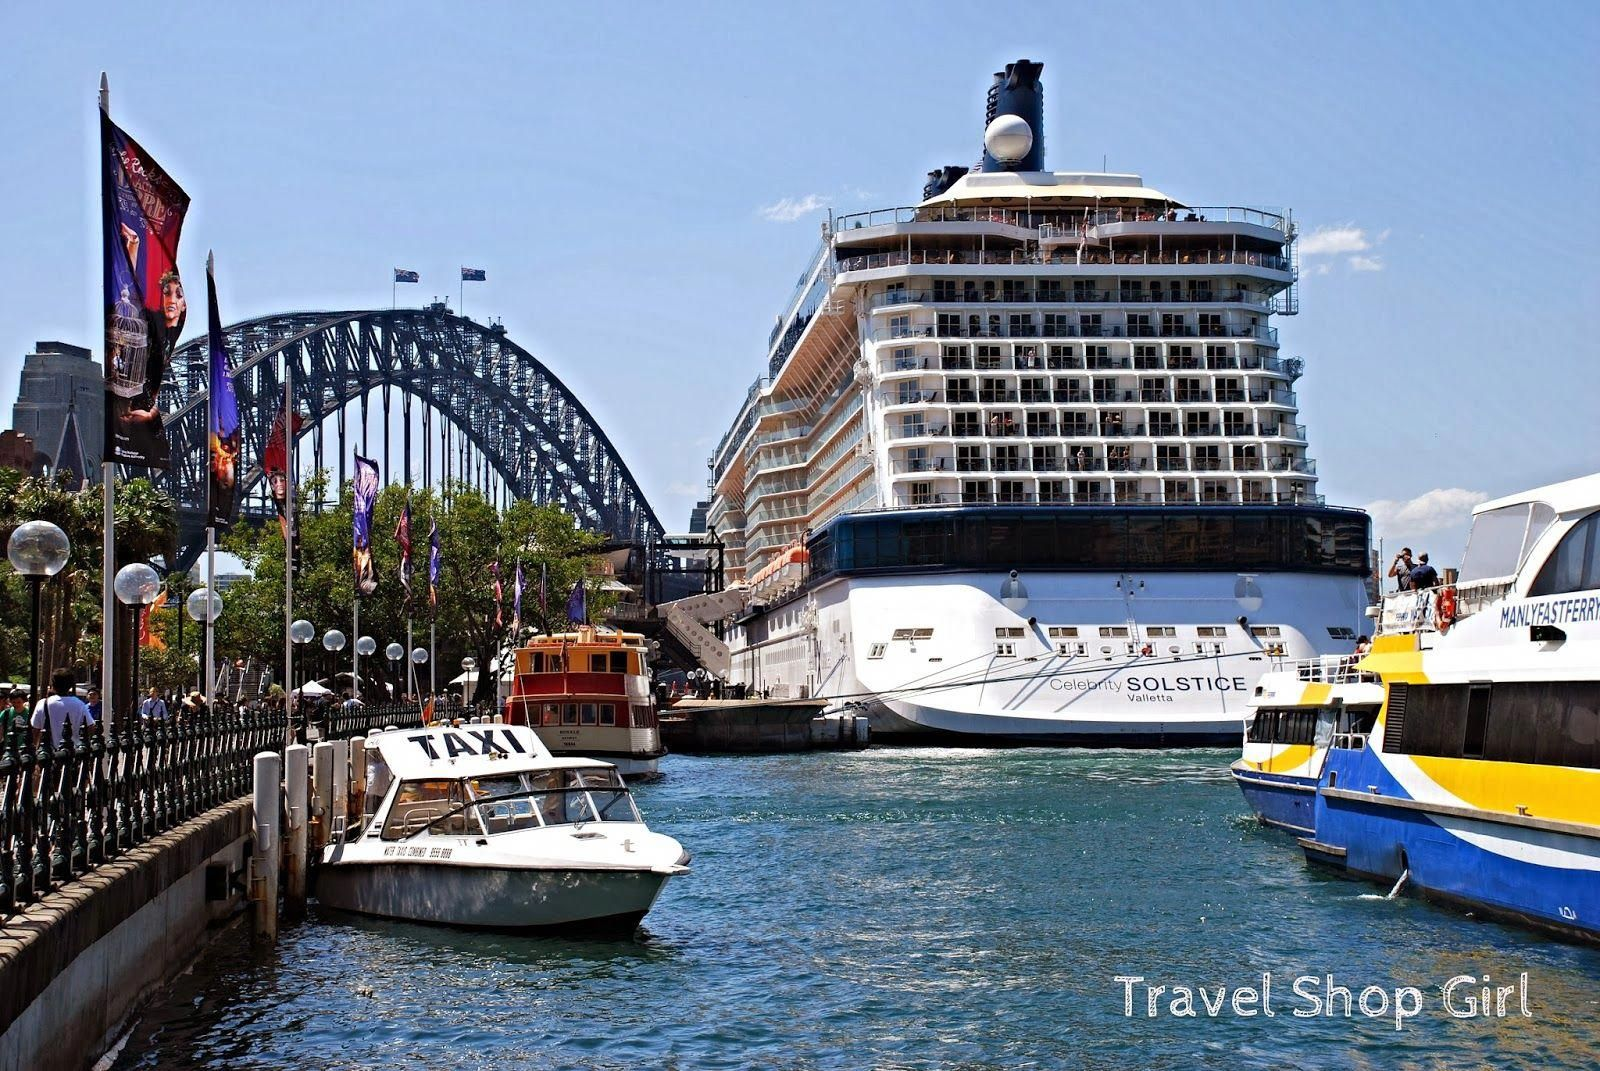 Travel Shop Girl Blog Overseas Passenger Terminal (OPT